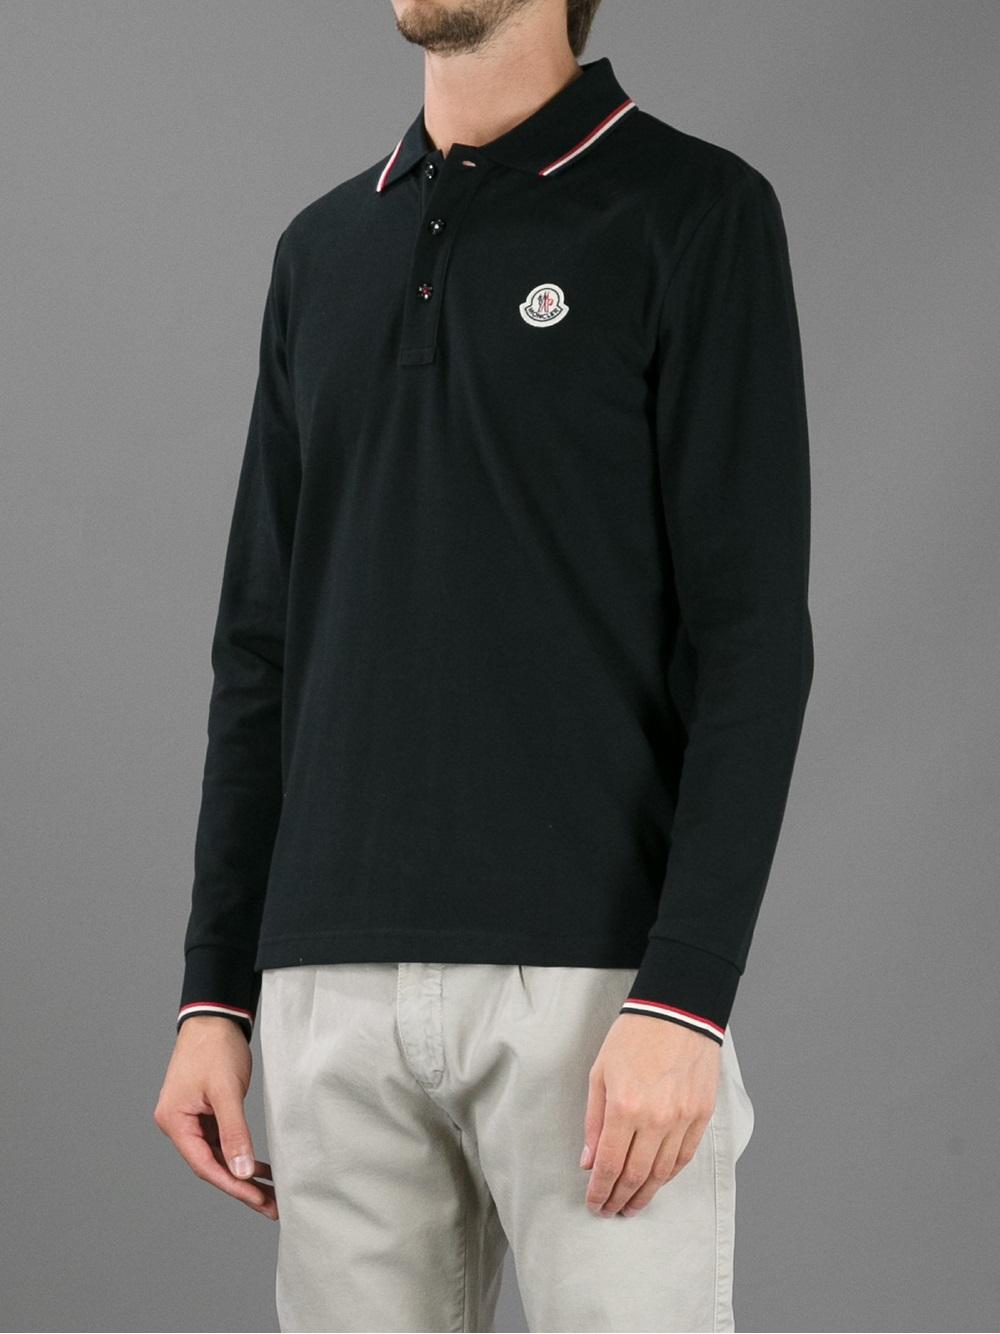 5222b59f Moncler Long Sleeve Polo Shirt in Black for Men - Lyst